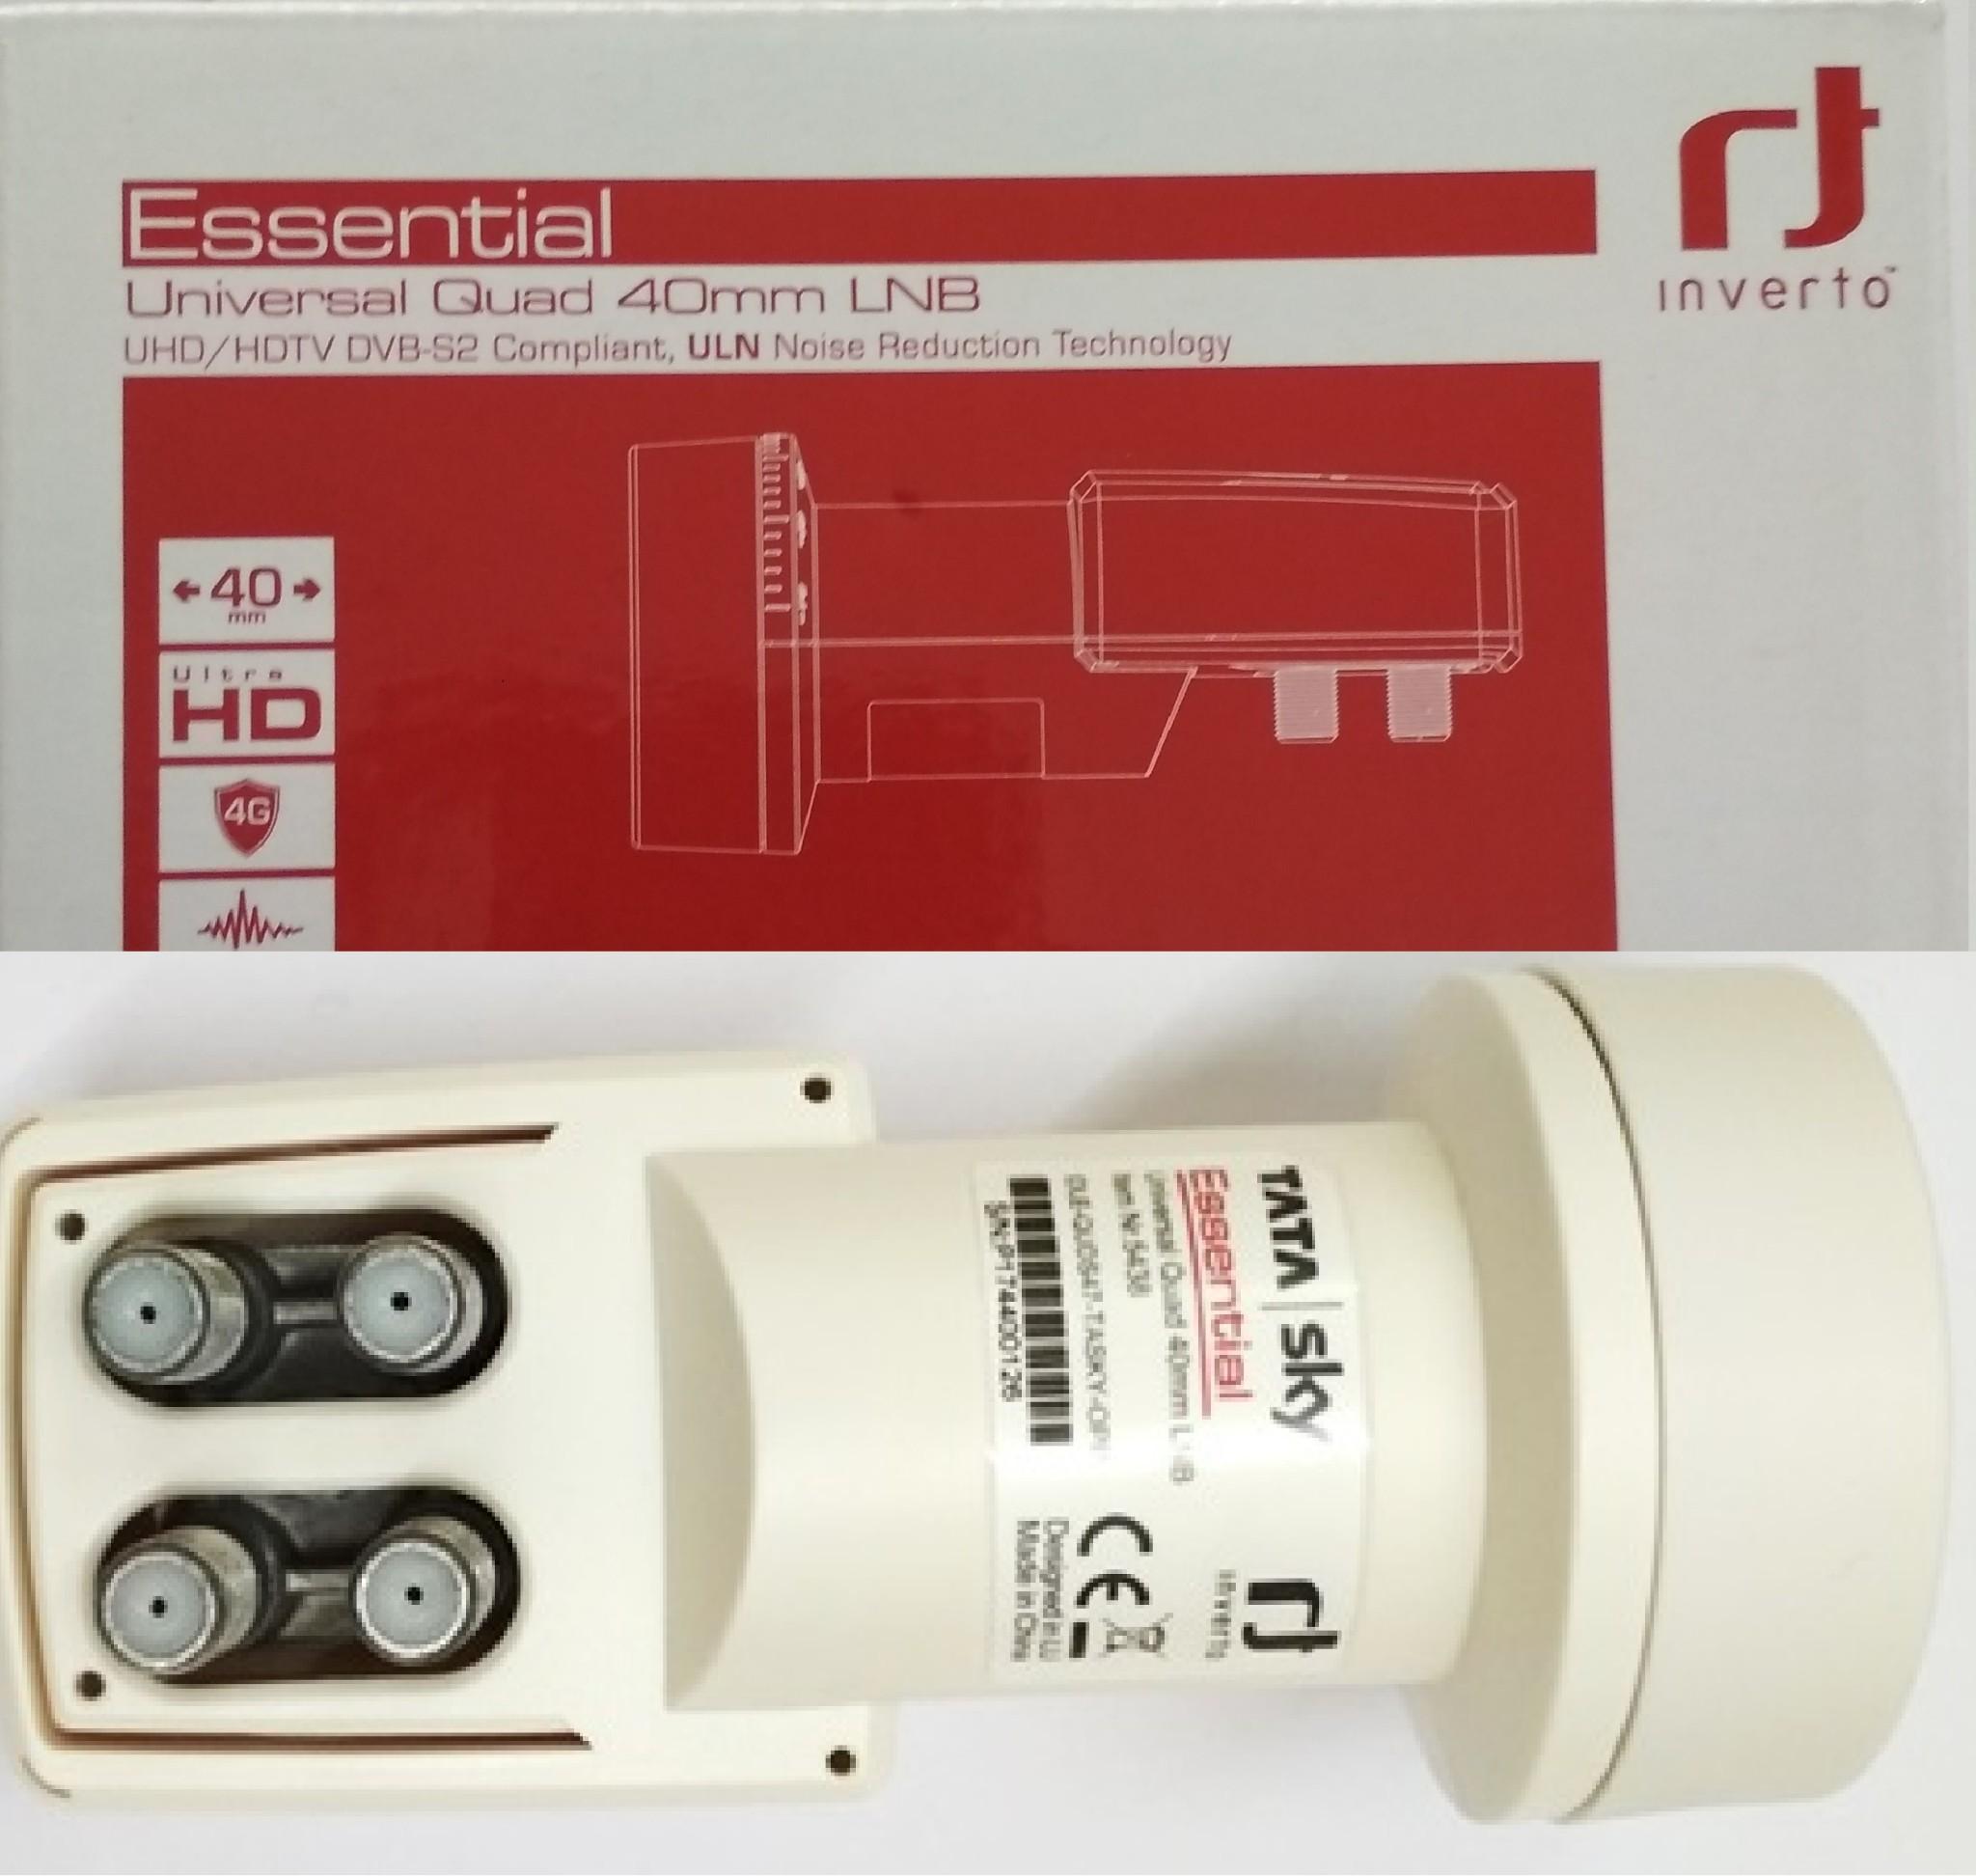 Inverto 4 Port Quad LNB Camera Dish TV Tata Sky Airtel Free to Air Videocon  Big tv